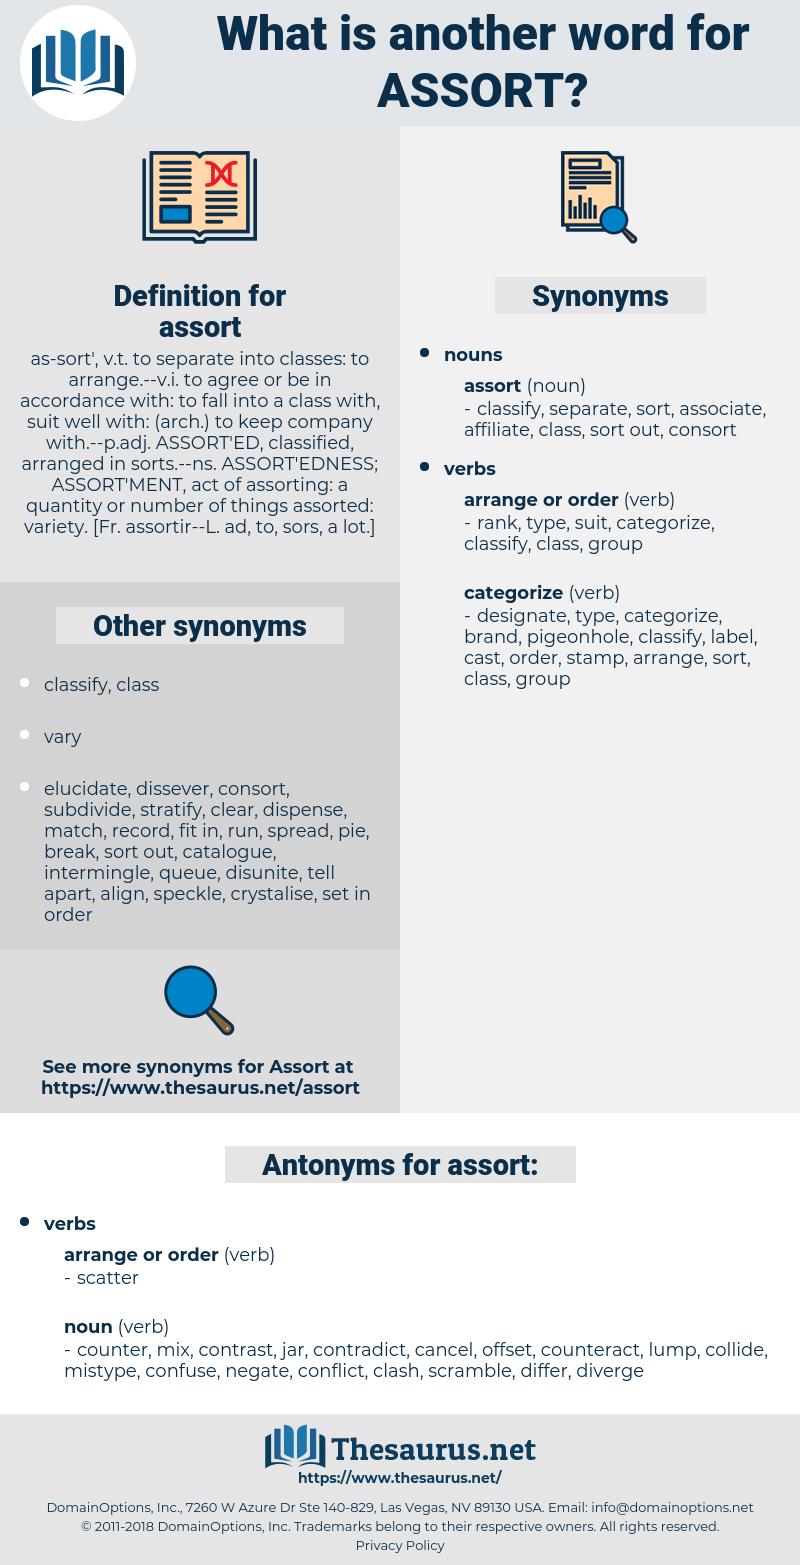 assort, synonym assort, another word for assort, words like assort, thesaurus assort